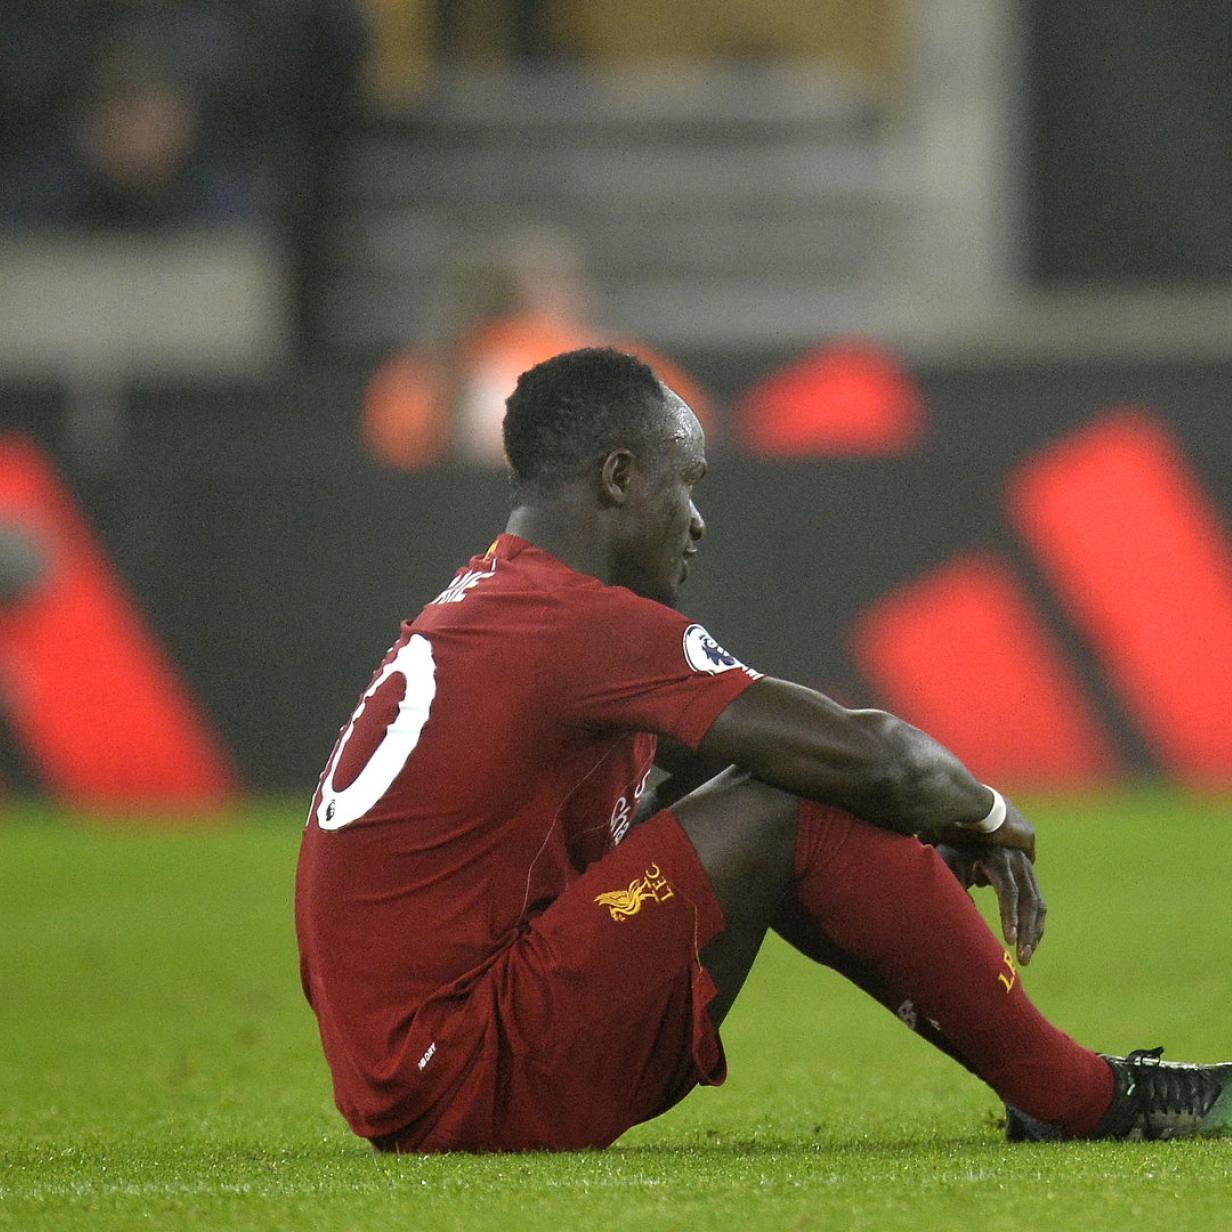 Fußball: Liverpool gewann knapp, verlor aber Mane